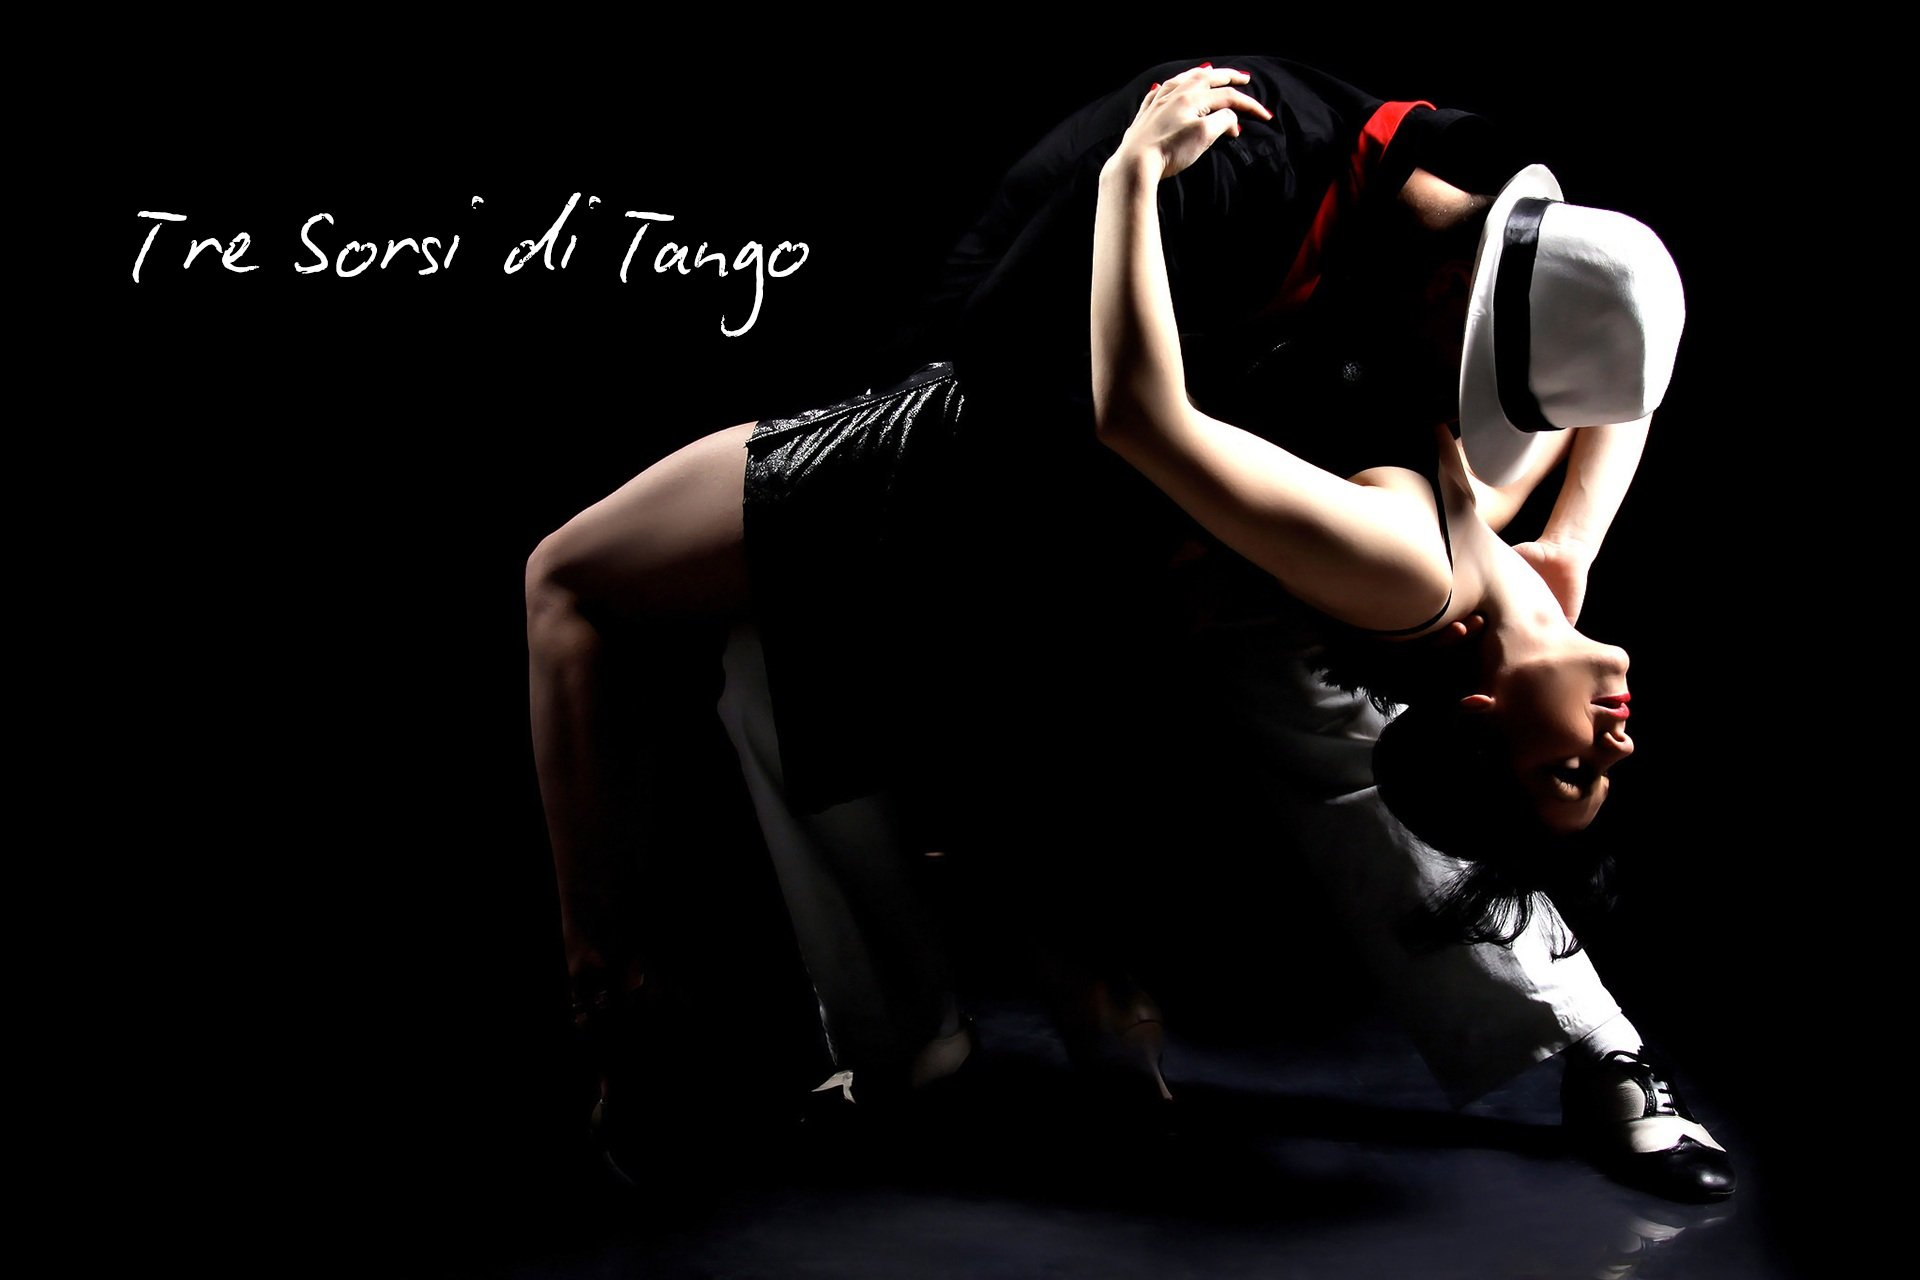 Tre sorsi di tango